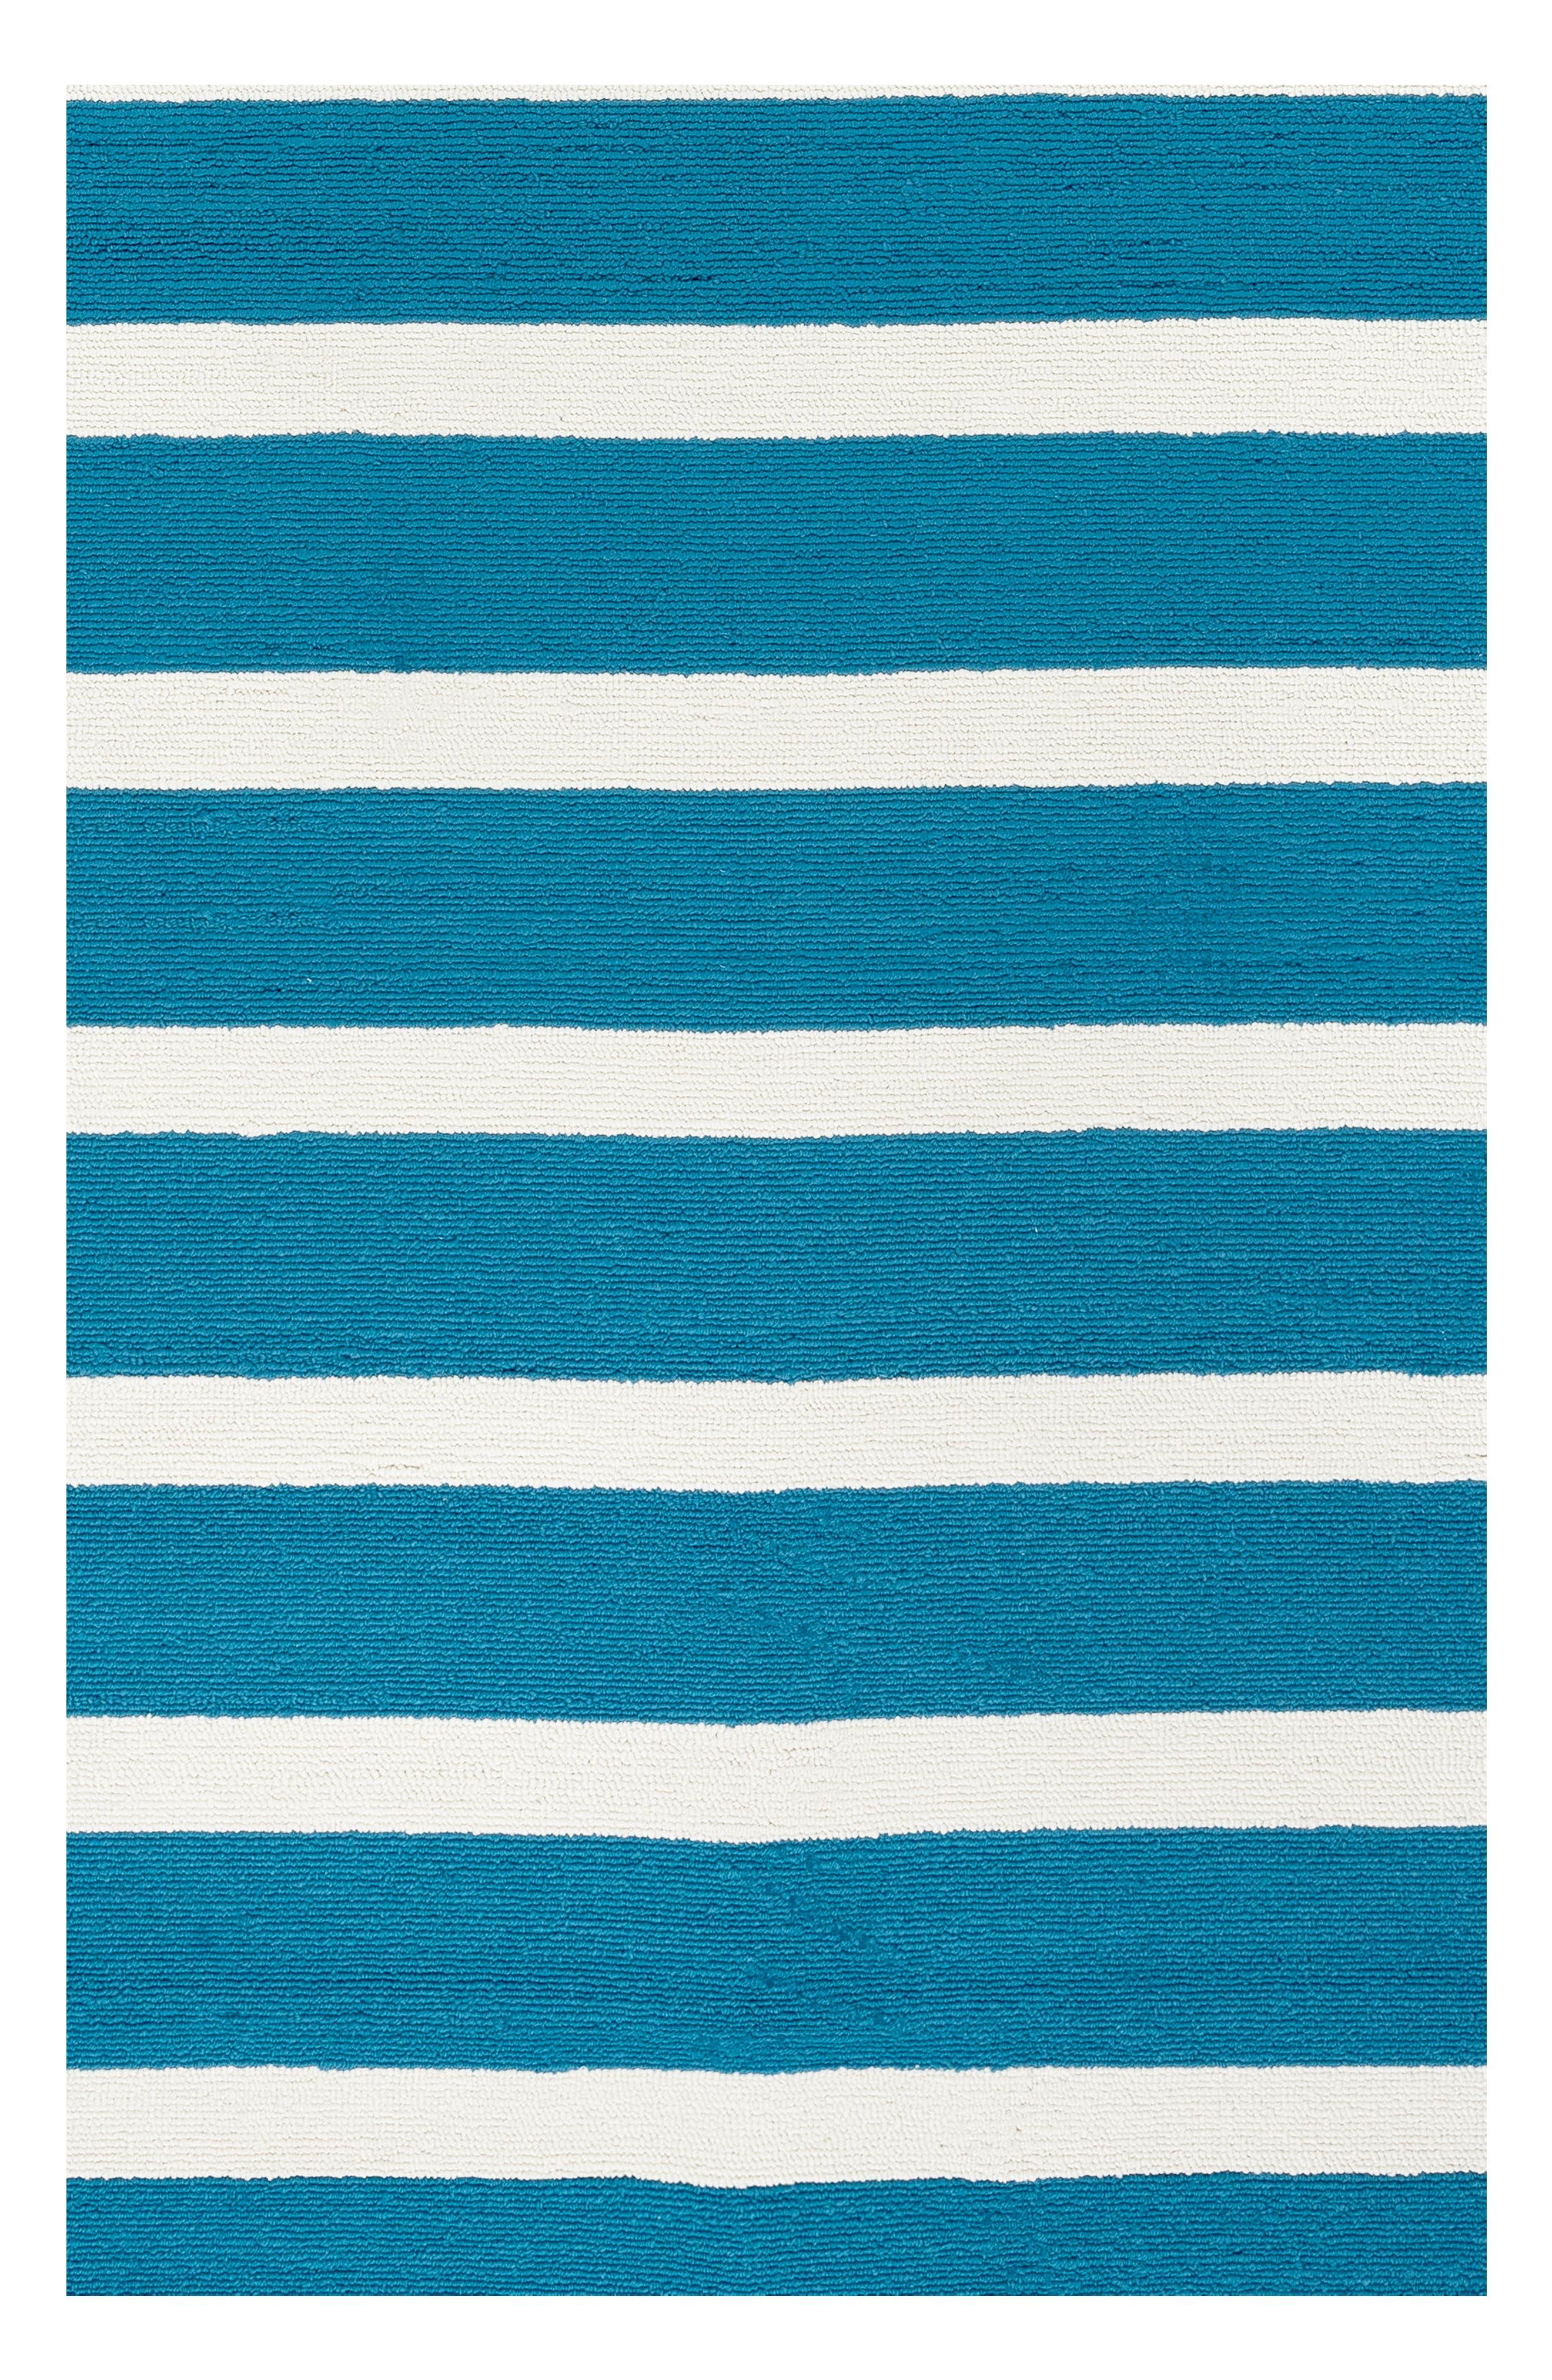 Azzura Hill Jenny Hand Tufted Rug,                             Alternate thumbnail 2, color,                             Marine Blue